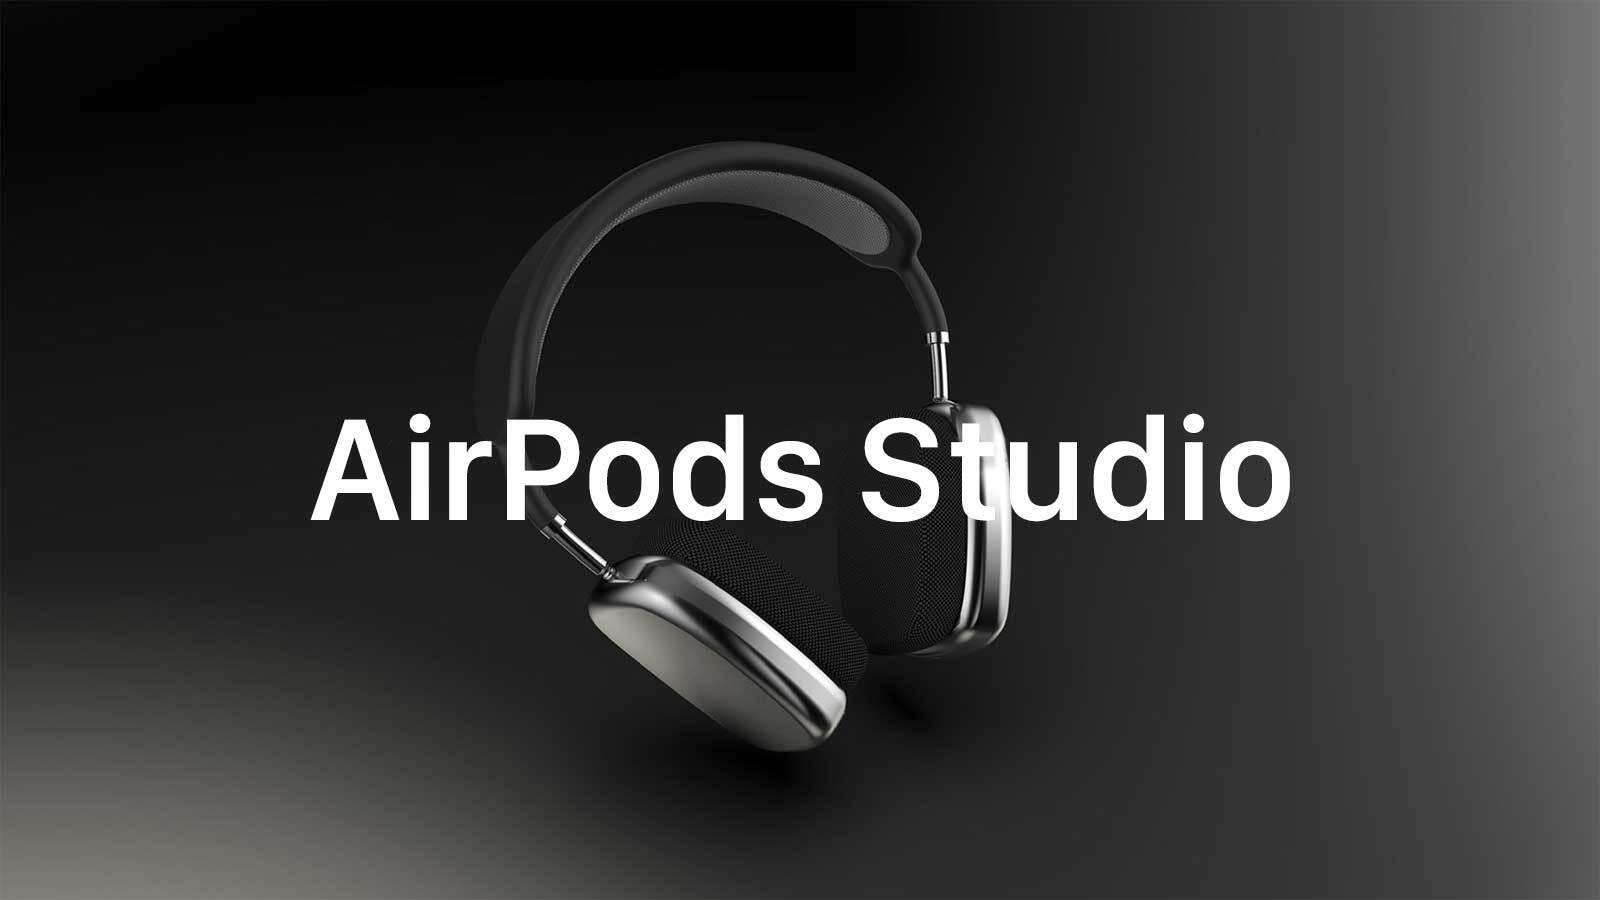 airpods studio از مراسم «One More Thing» اپل چه انتظاراتی داشته باشیم؟ اخبار IT